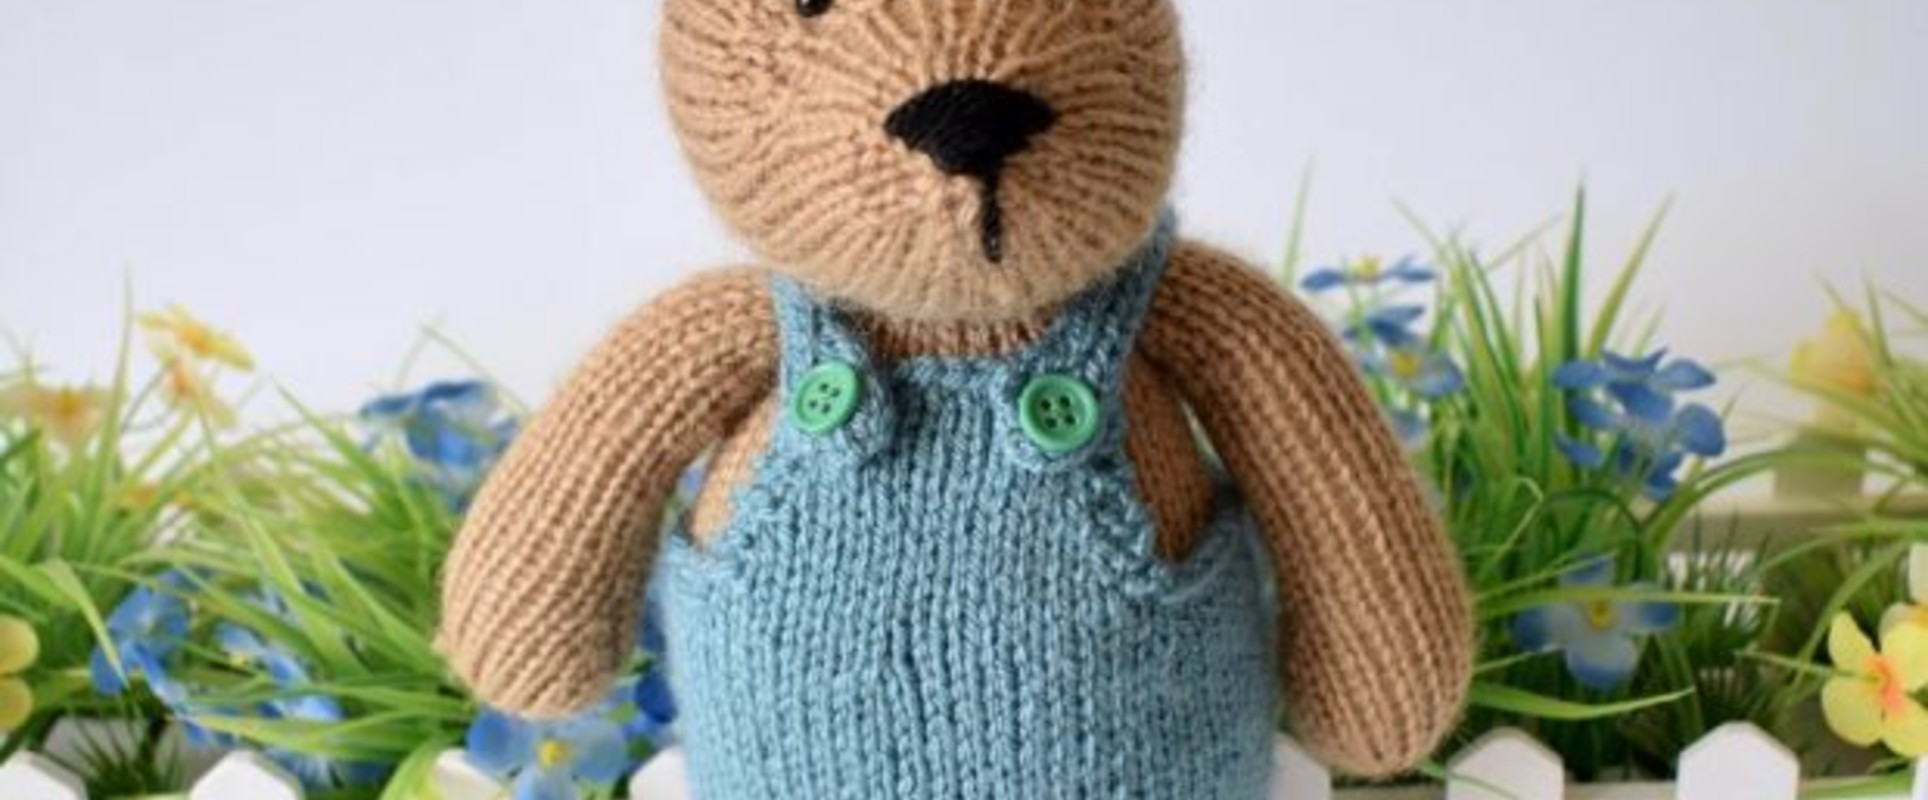 Teddy Bear Patterns Our Top 10 Loveknitting